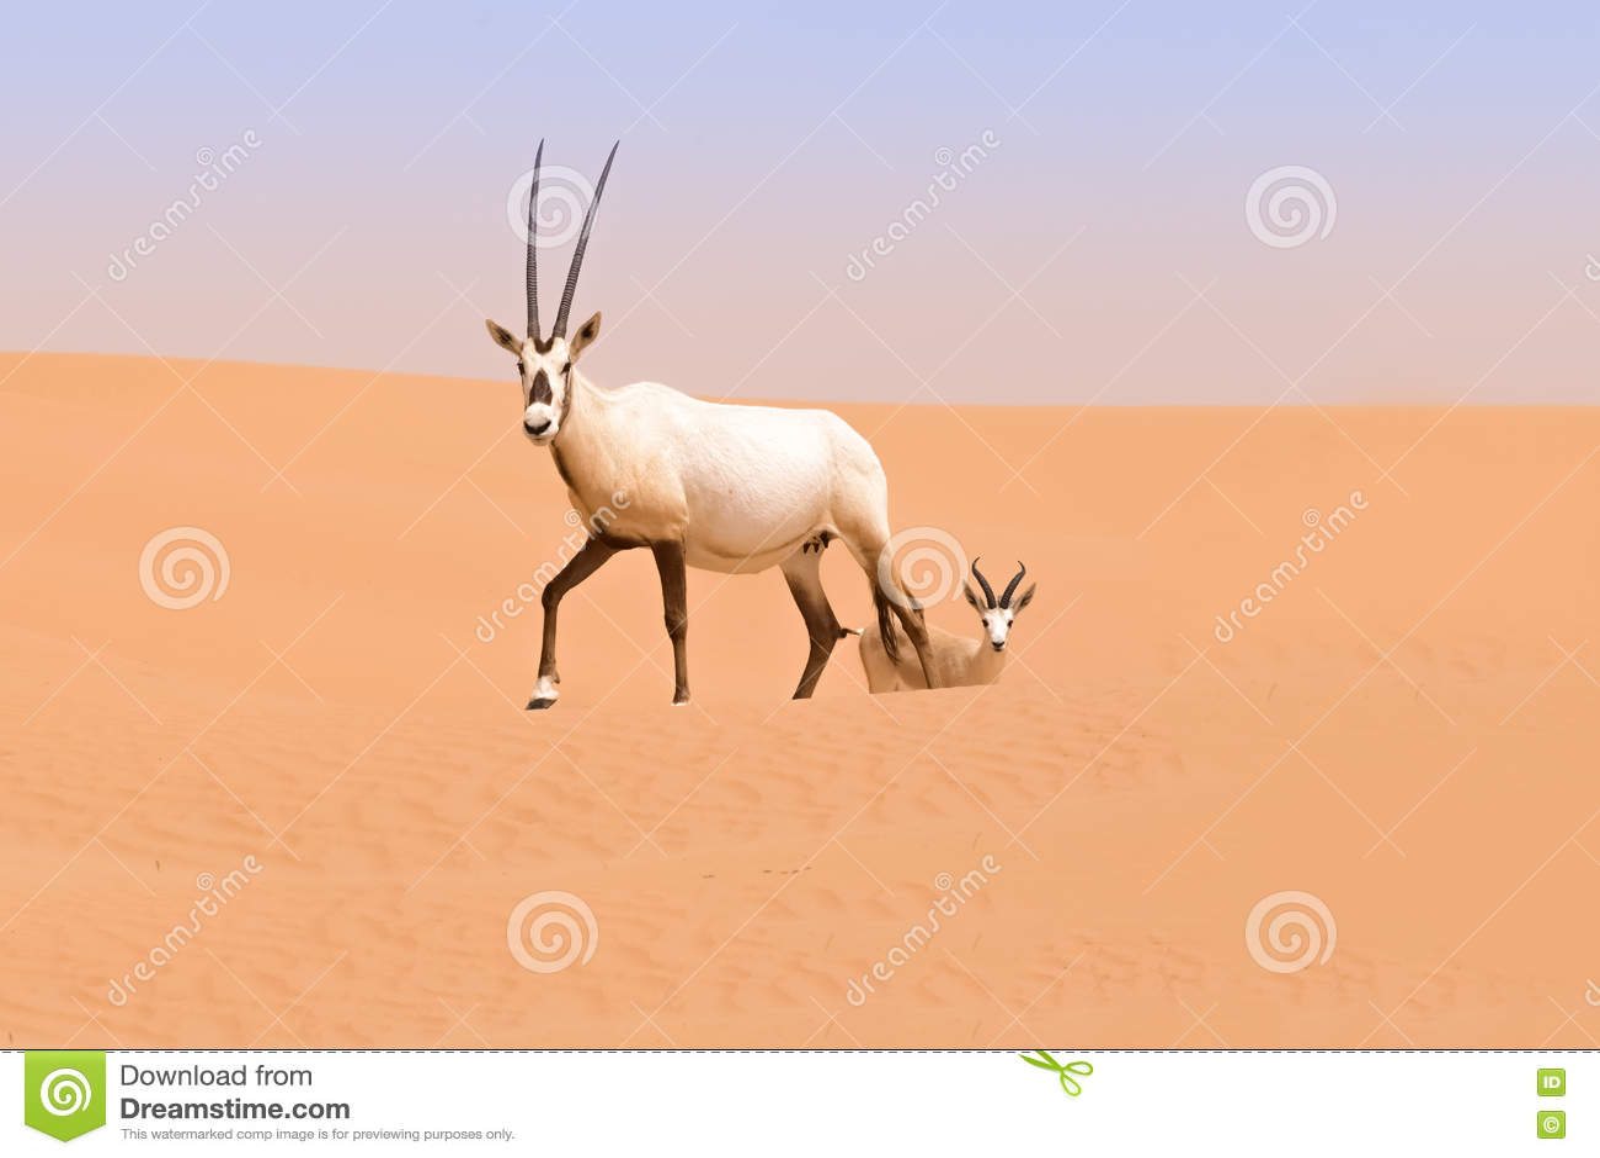 Oryx family in the dunes of the Dubai Desert Conservation Reserve, UAE